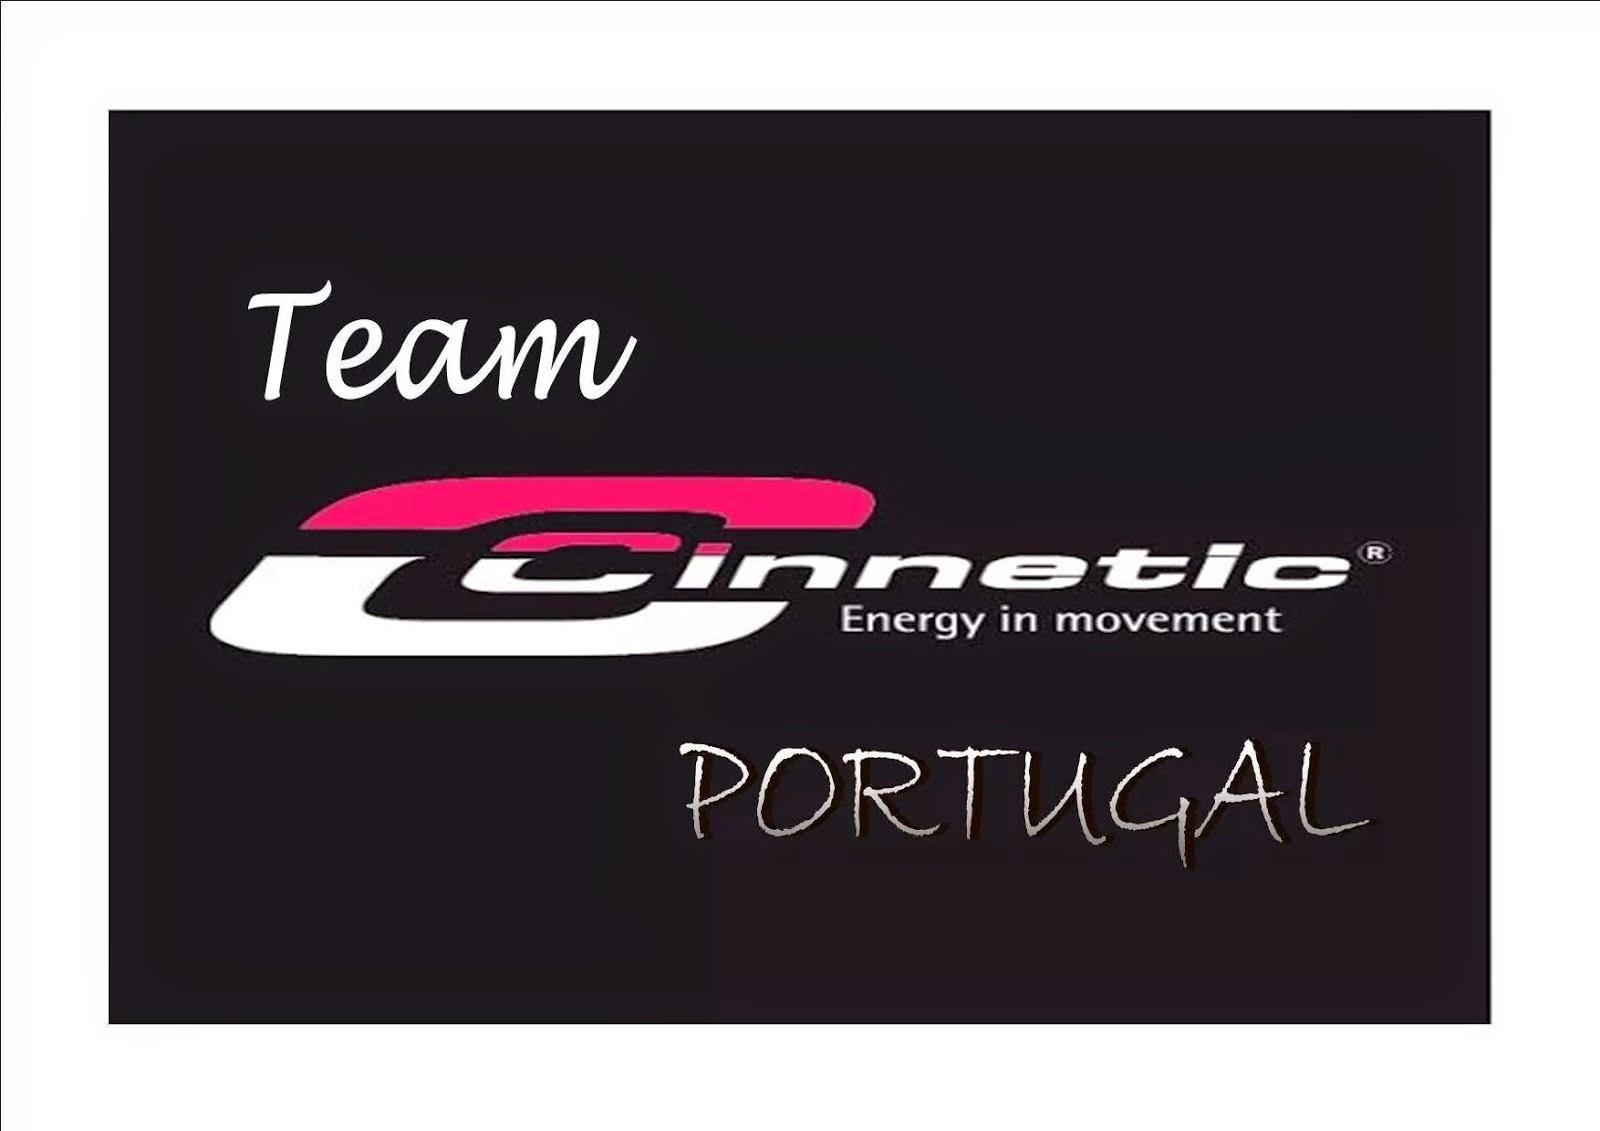 Team Cinnetic Portugal